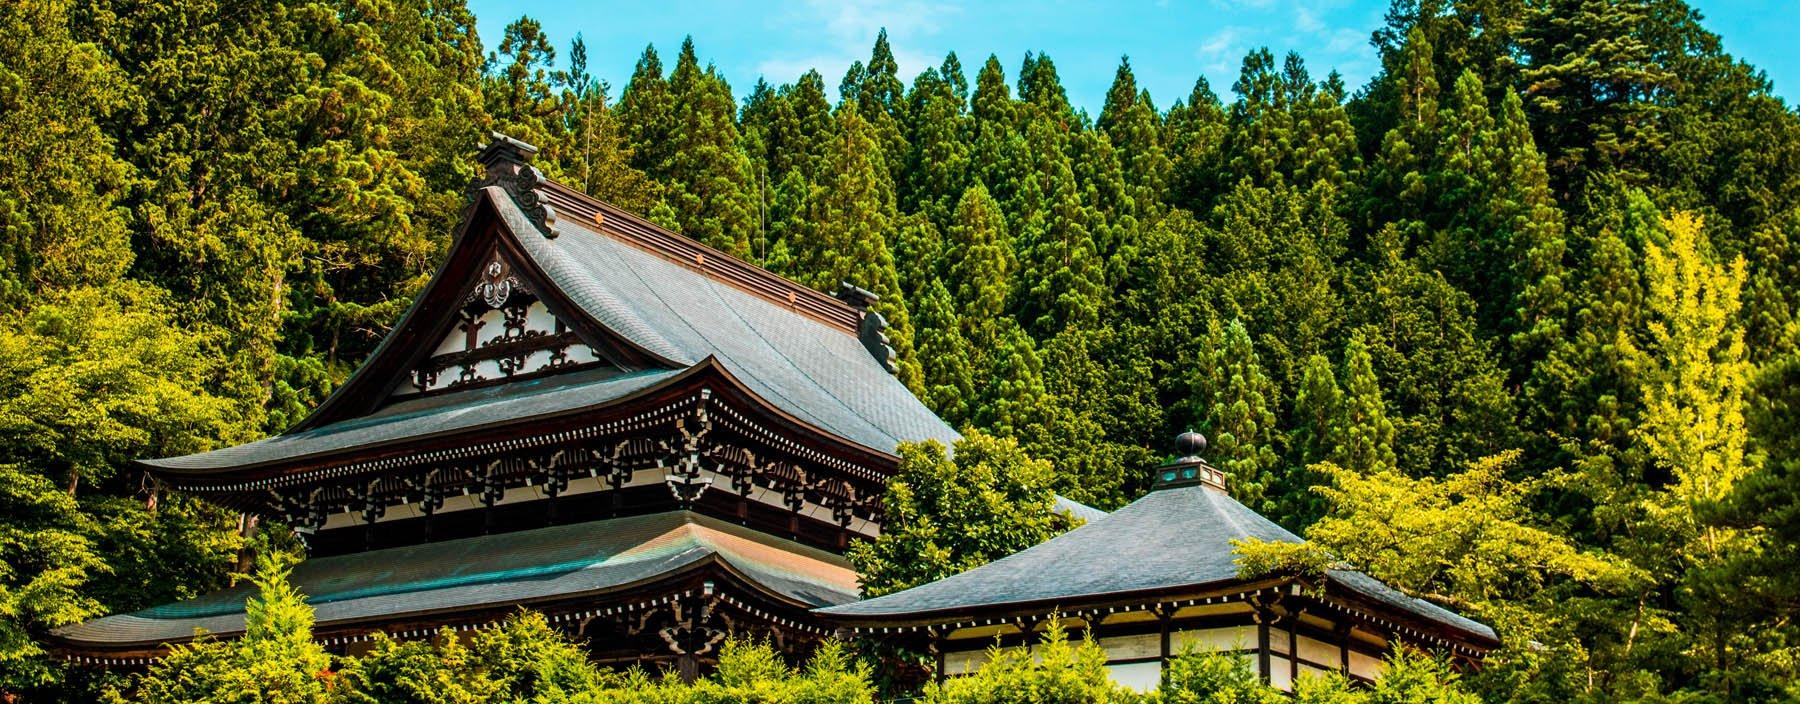 jp, takayama, oude japanse tempel.jpg